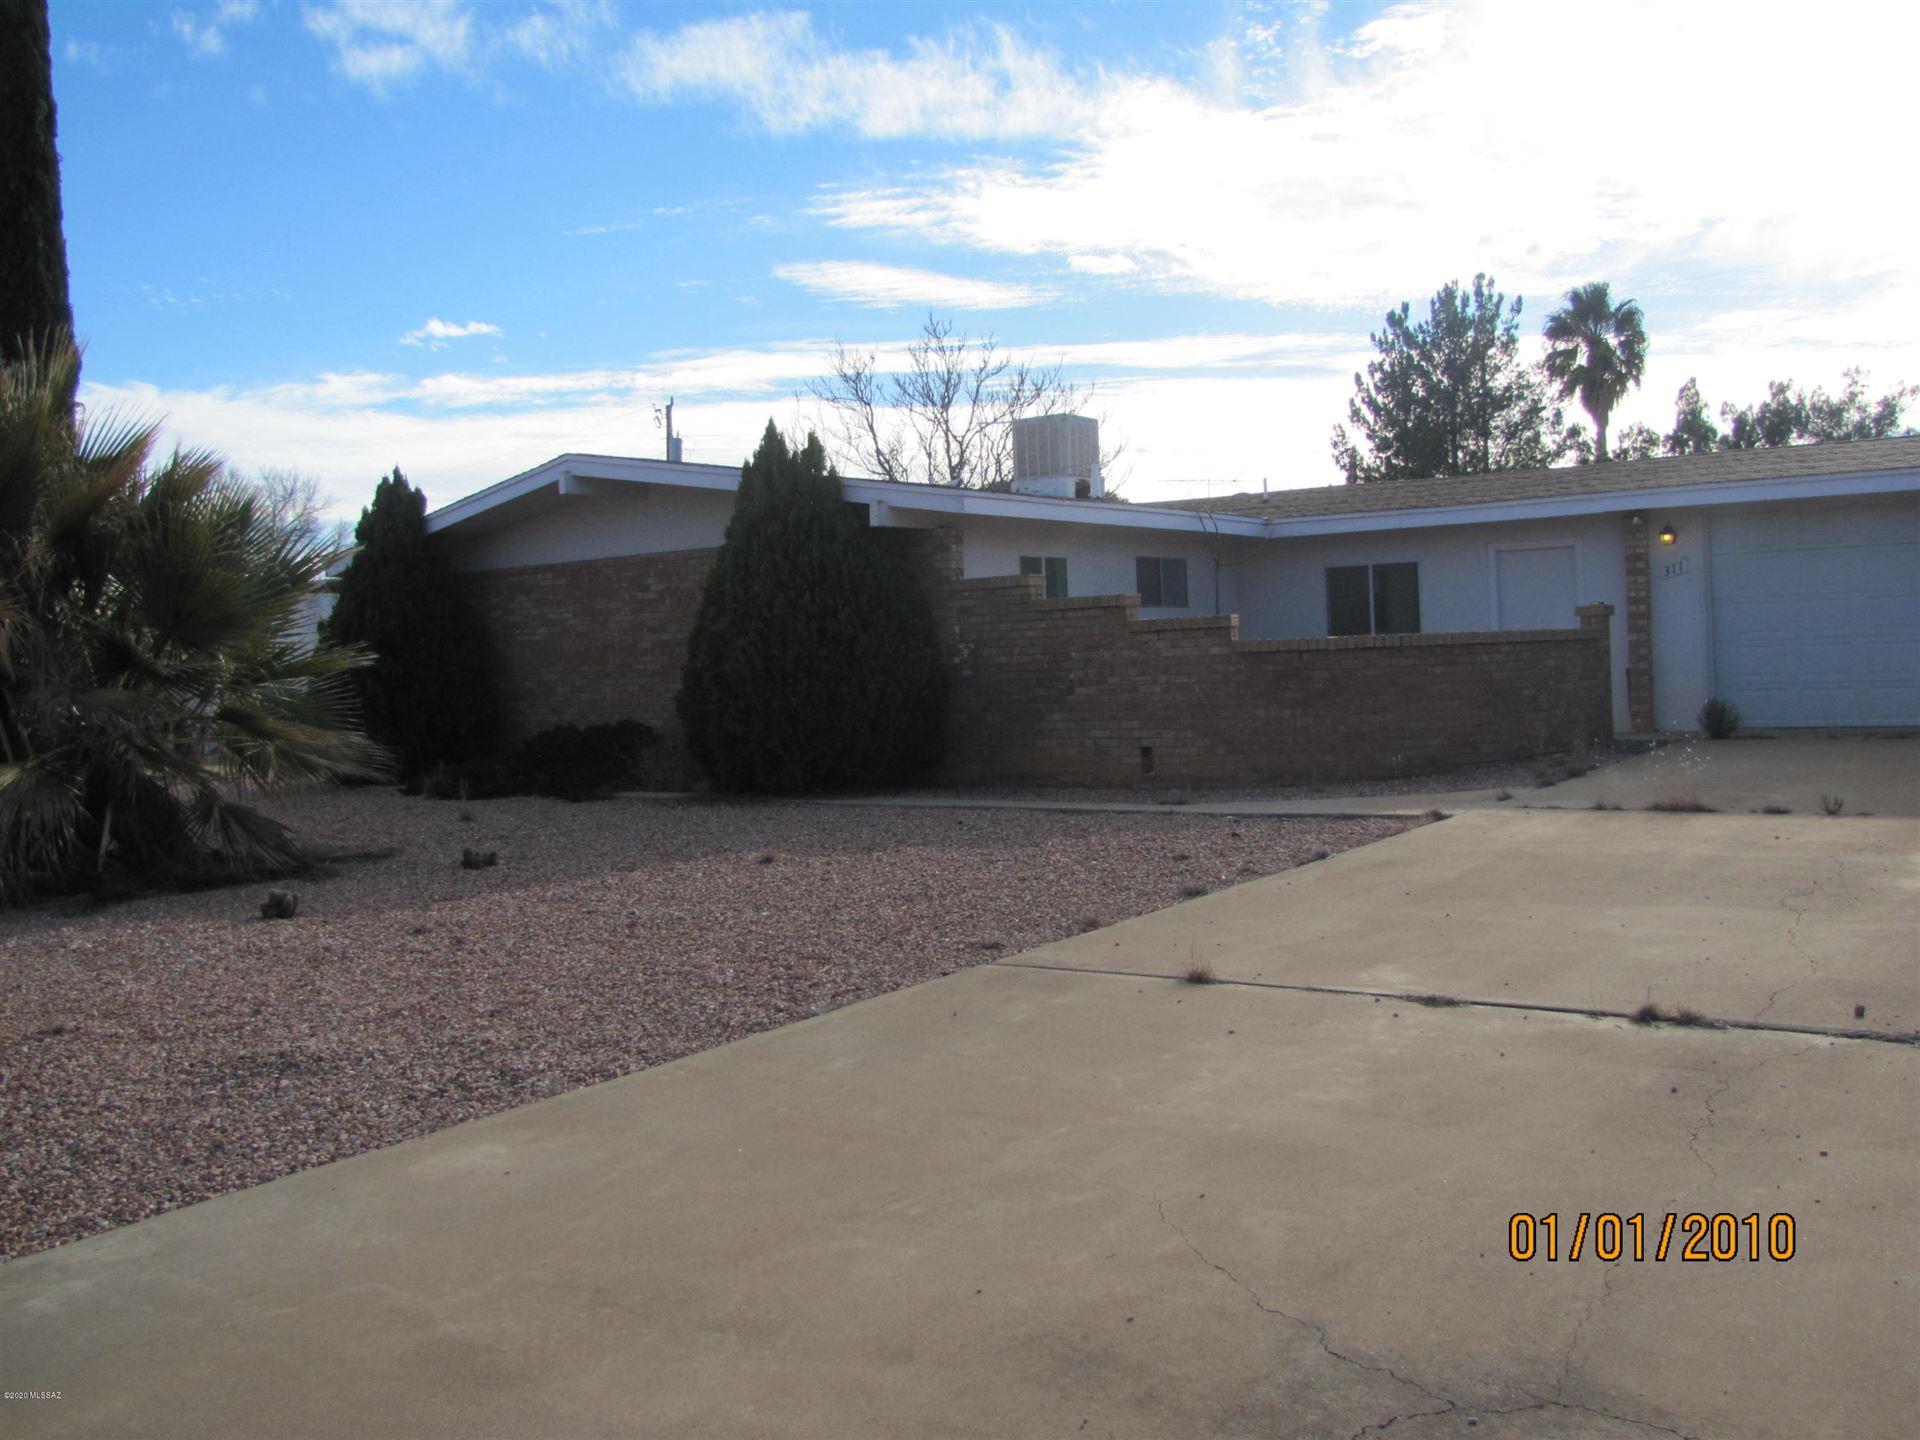 311 N Flynn Jans Court, Pearce, AZ 85625 - MLS#: 22028806